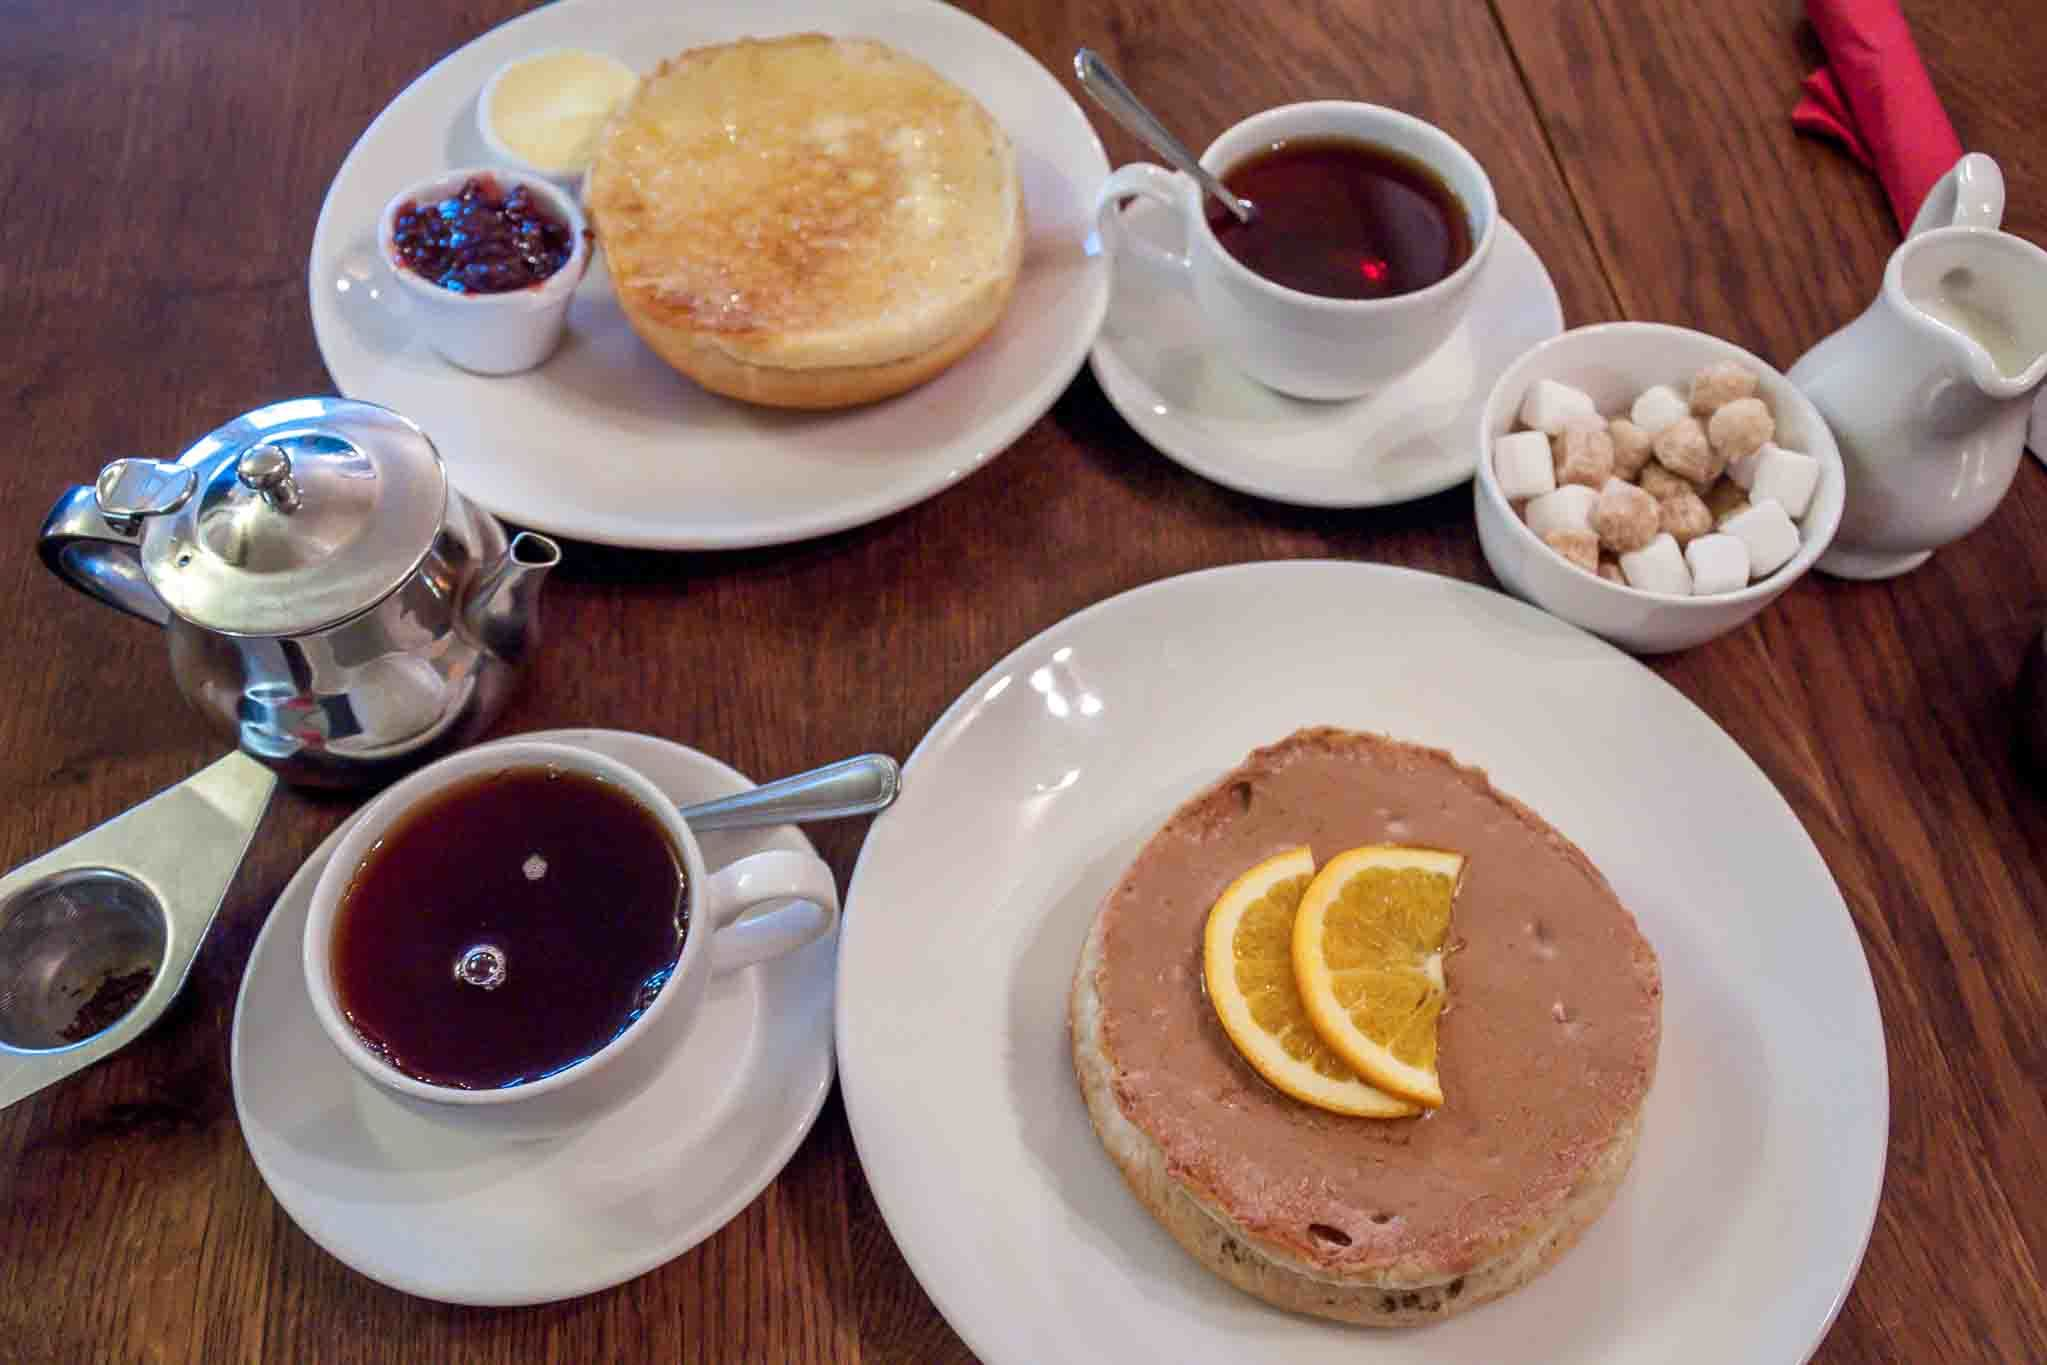 Sally Lunn buns with butter or cinnamon spread and tea